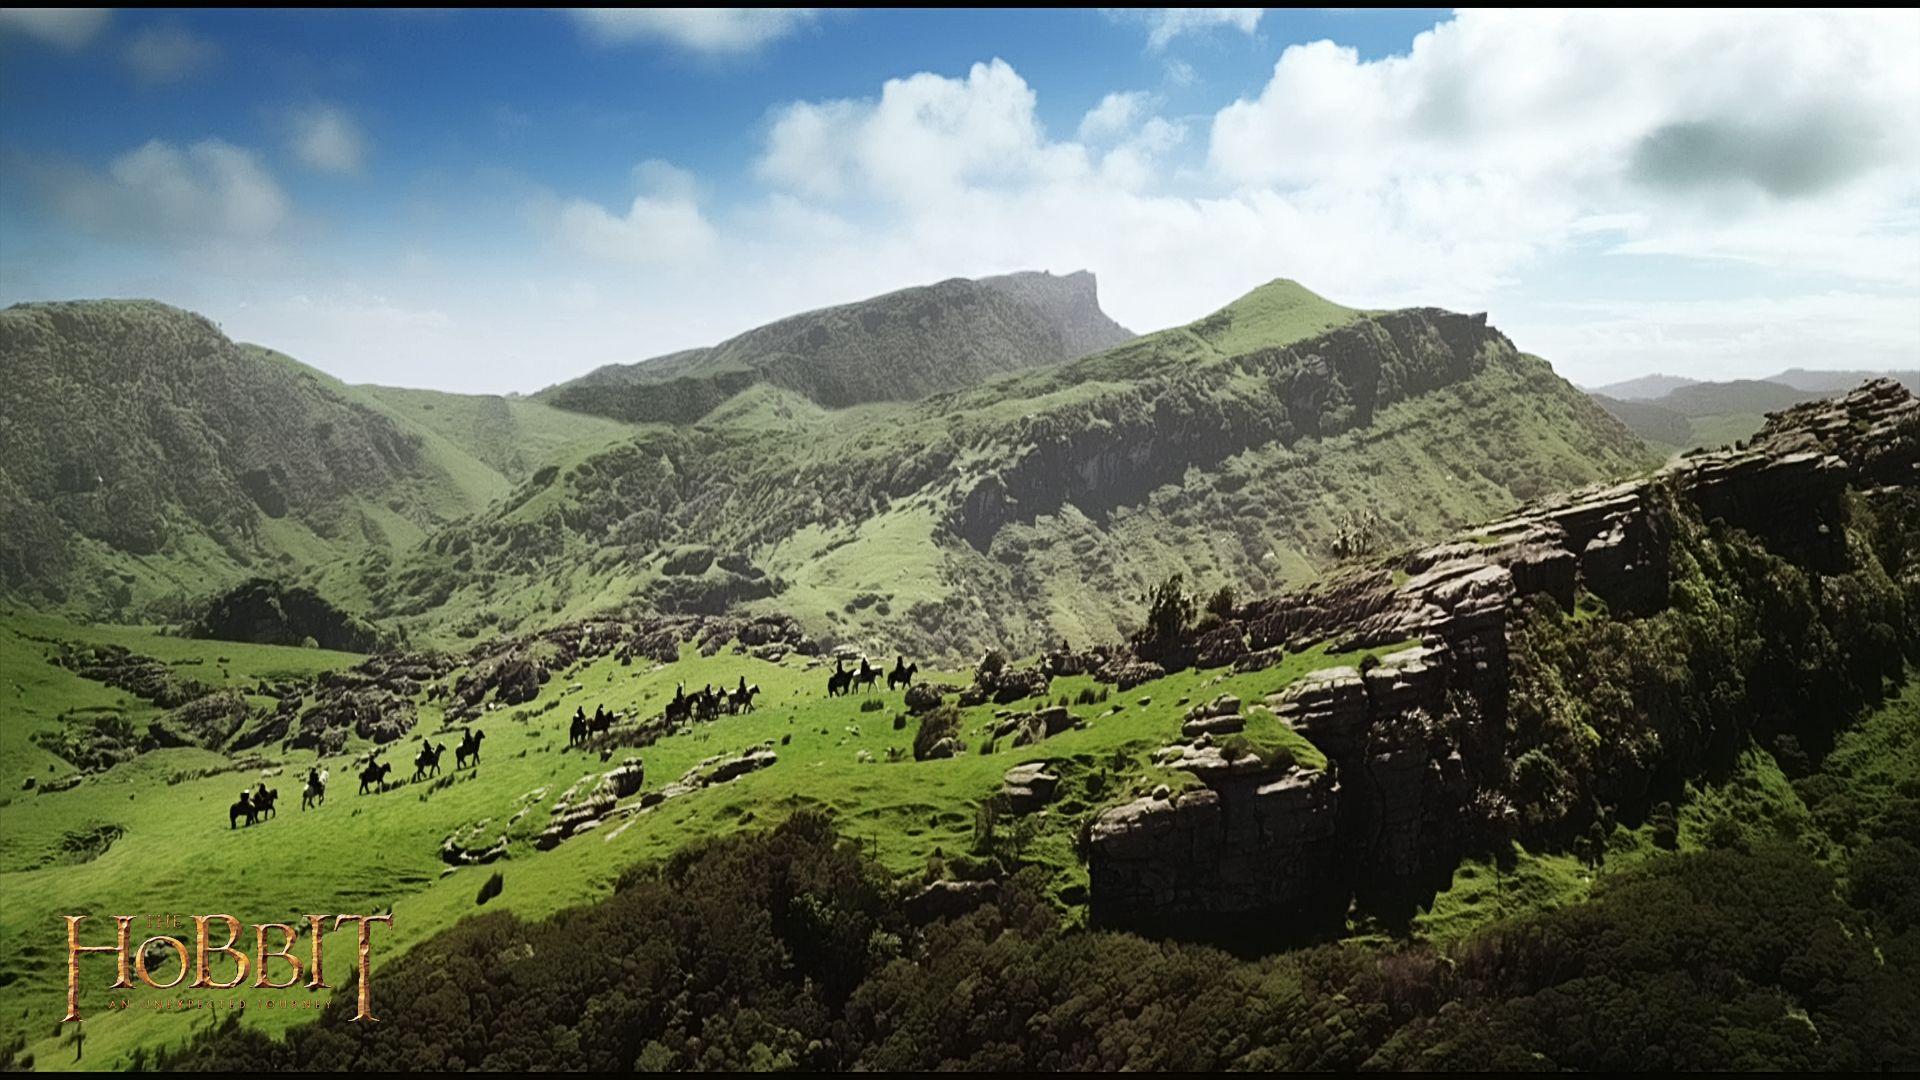 The Hobbit An Unexpected Journey Wallpaper